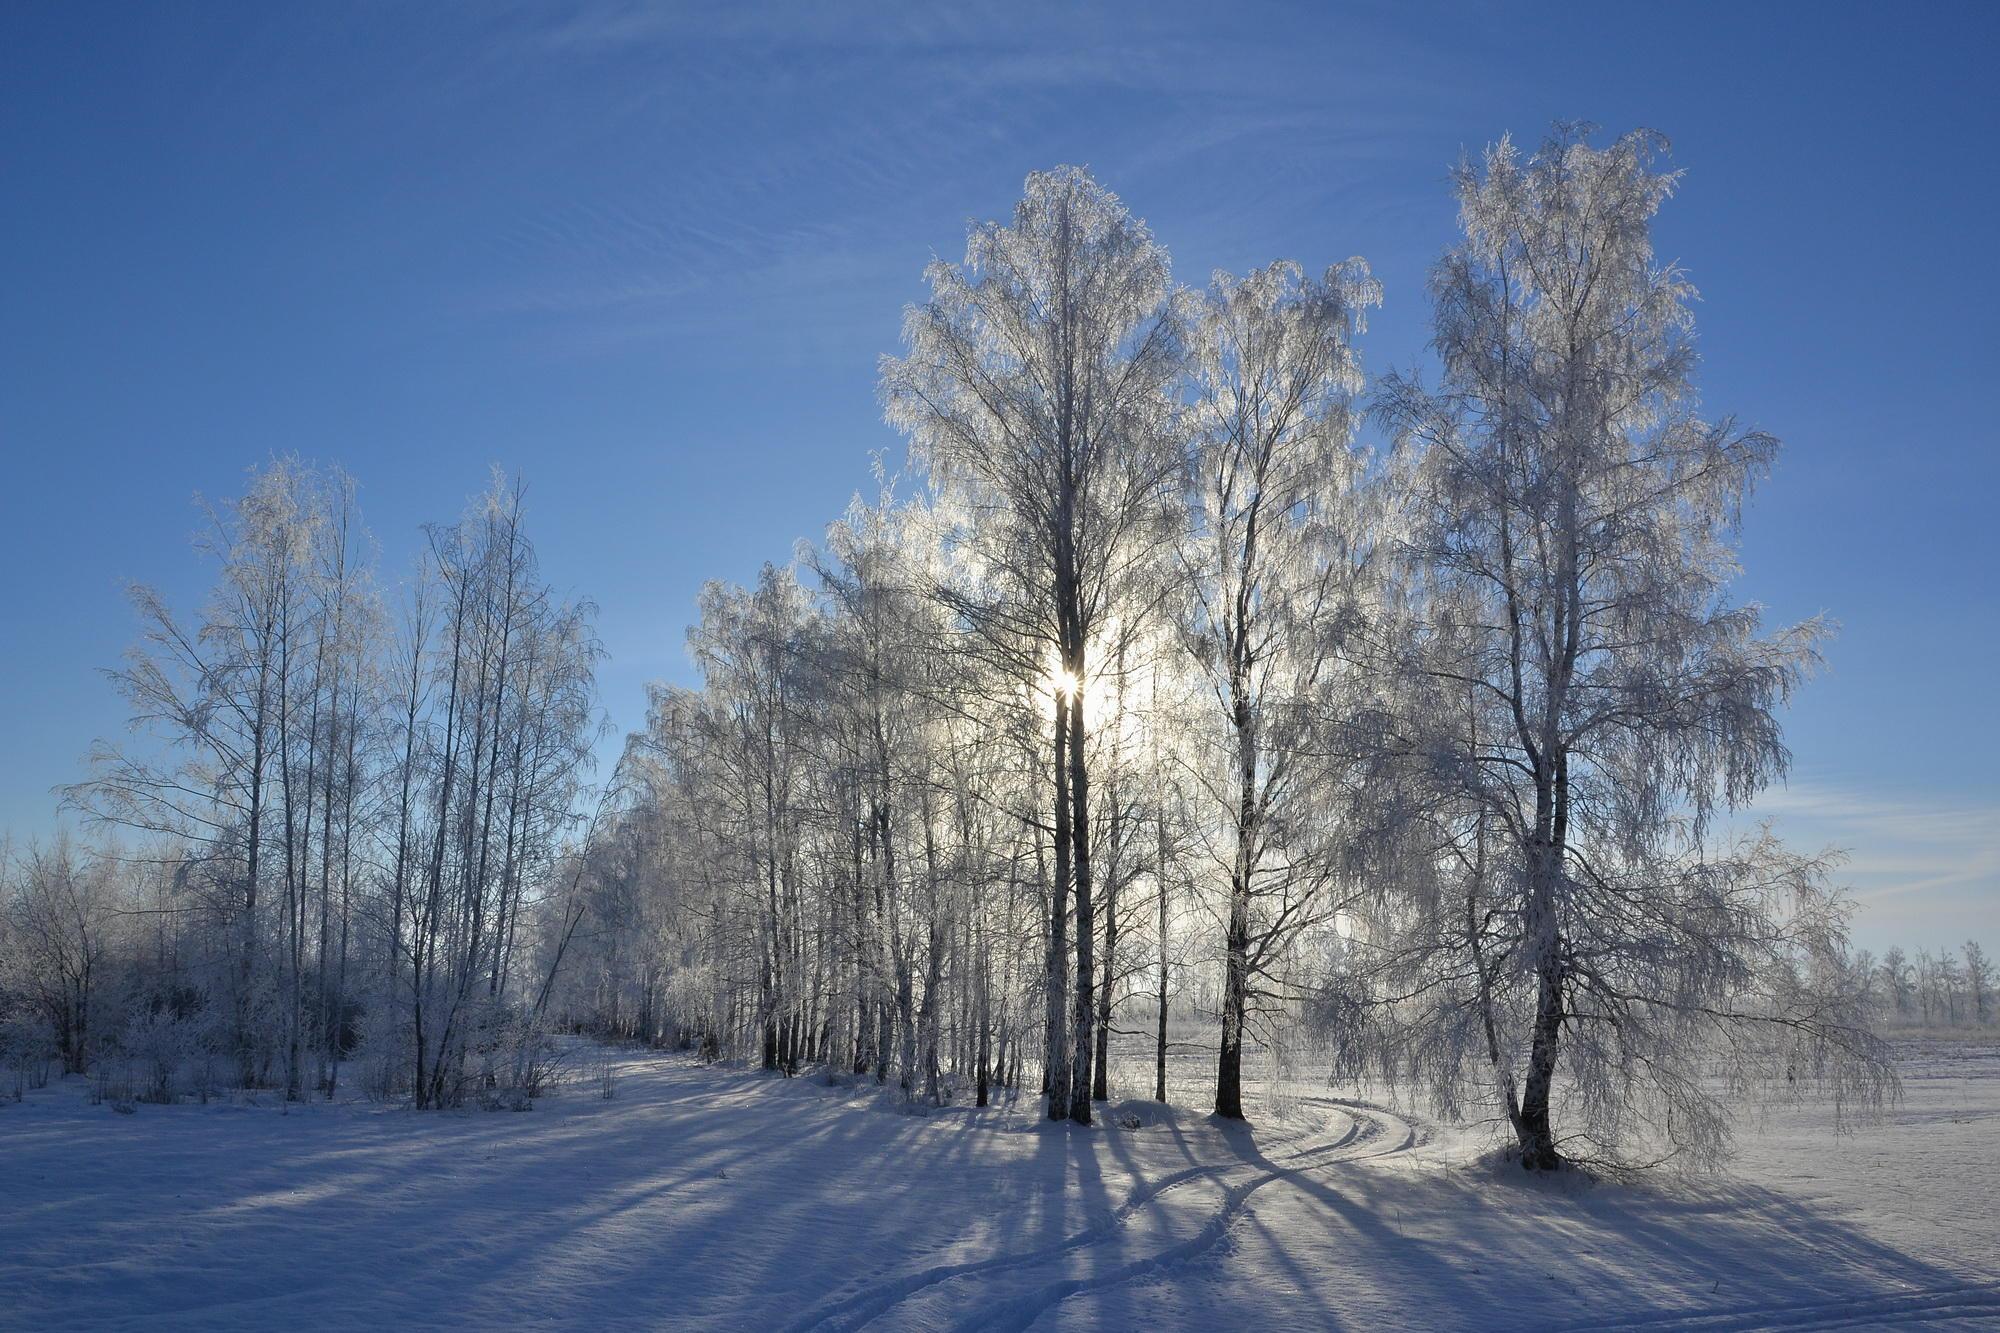 обои зима, снег, деревья, сугробы картинки фото